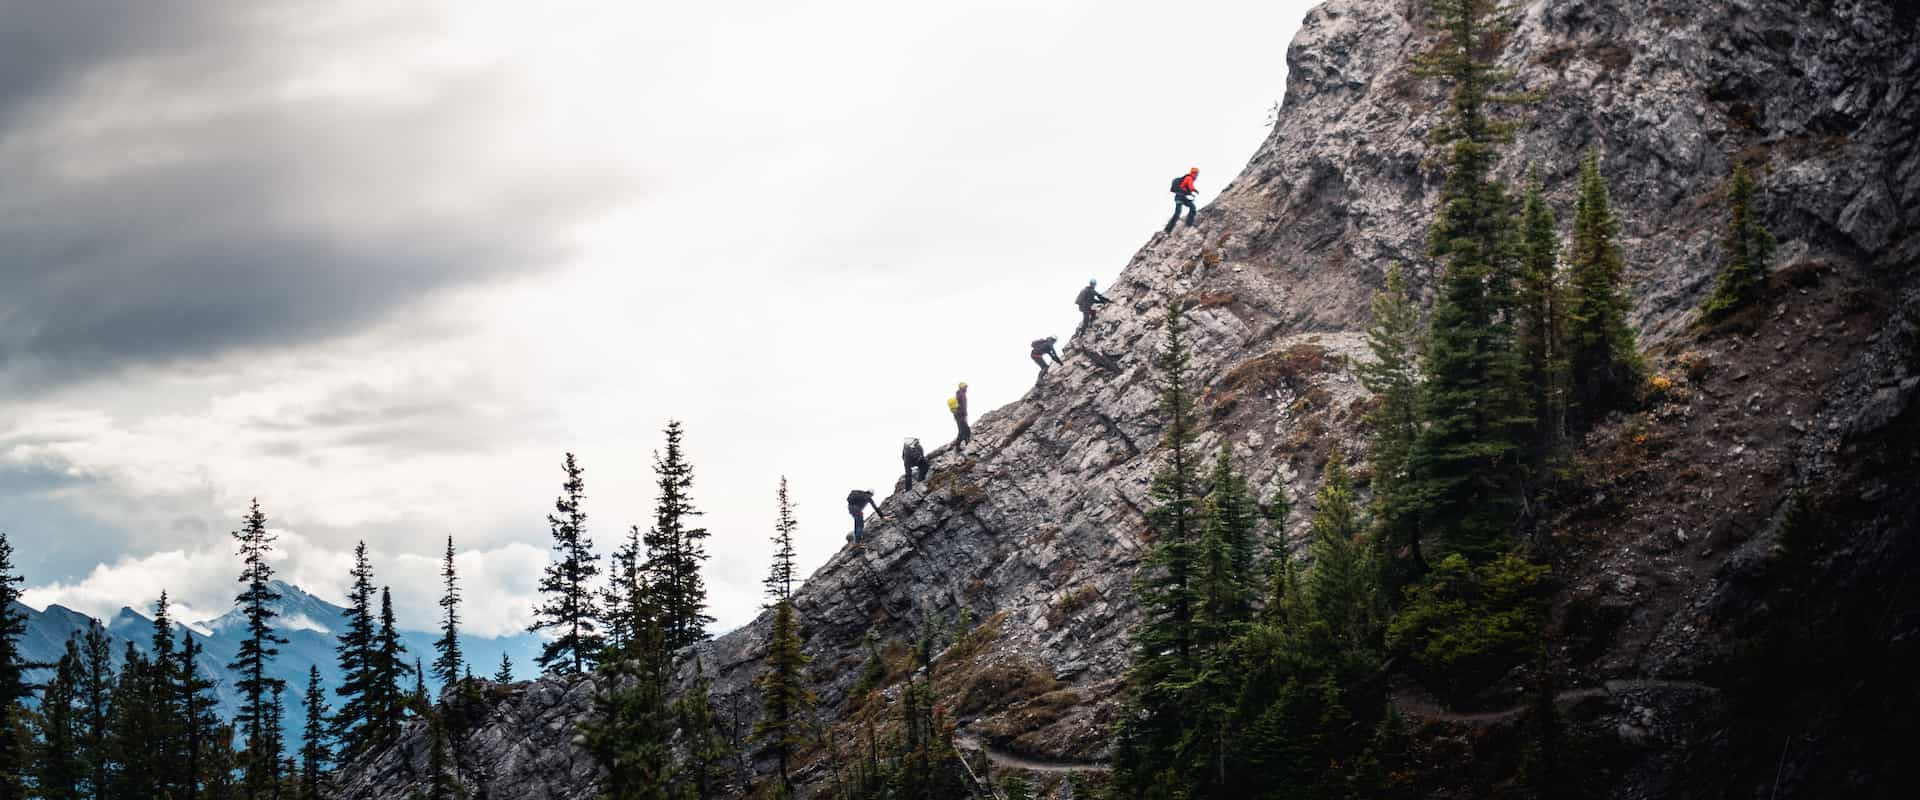 Via Ferrata Alpinist – 4-4.5 Hours